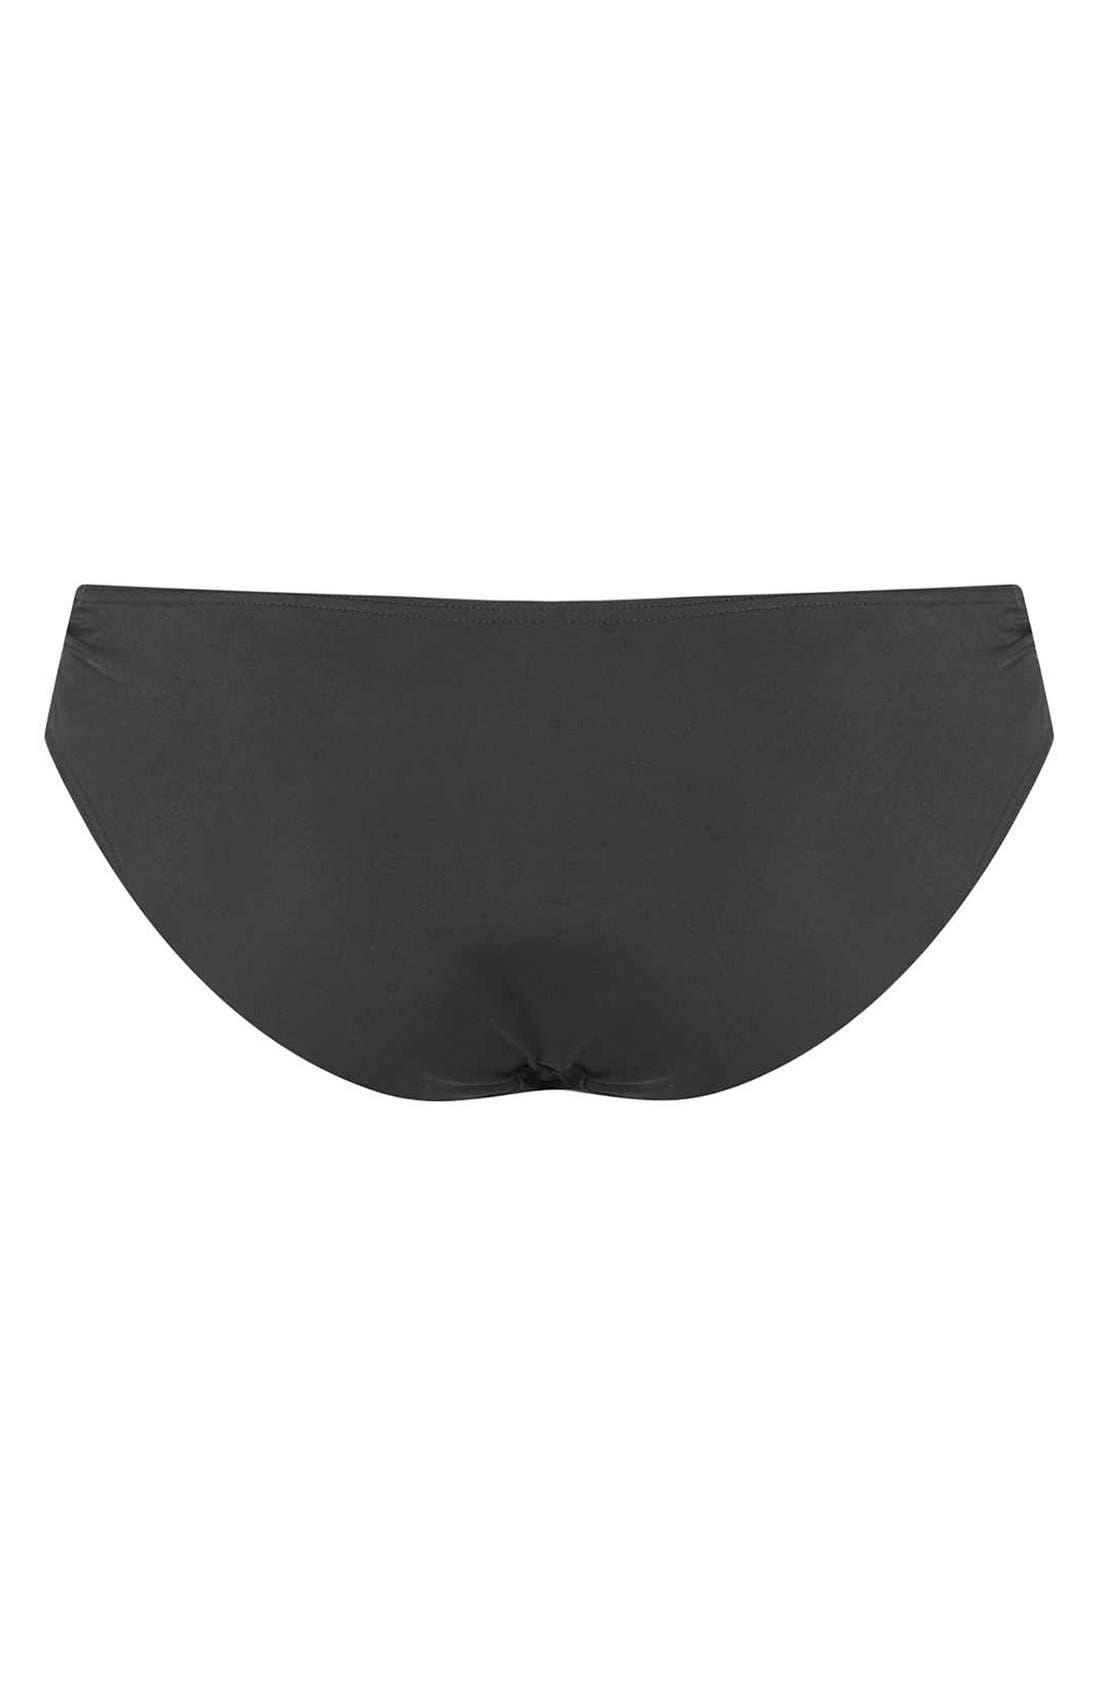 Alternate Image 2  - Topshop 'Diamond' Ruched Side Bikini Bottoms